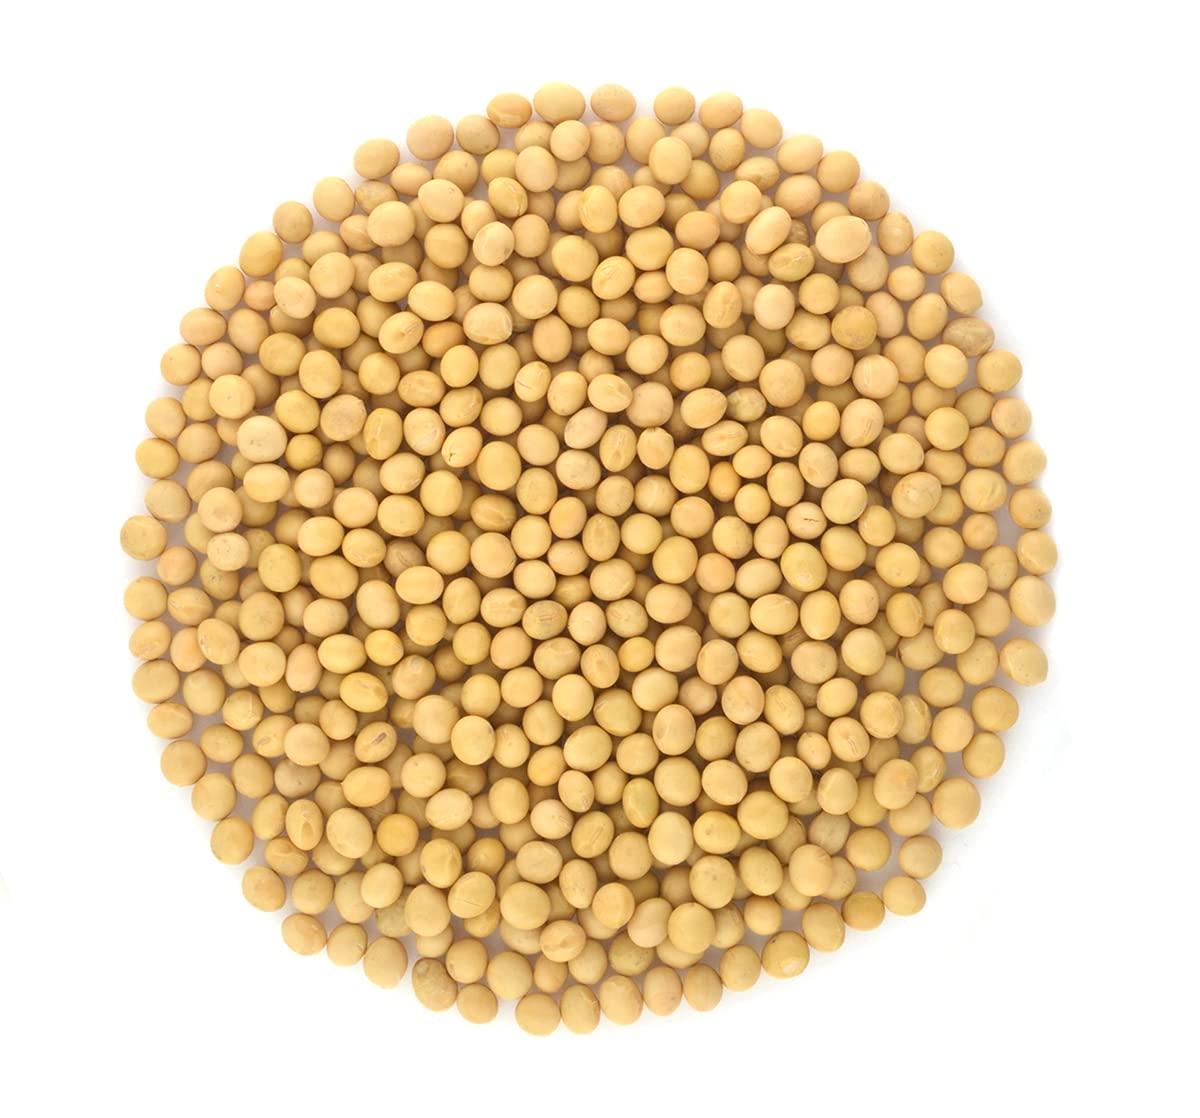 Organic Soy Beans- Protein rich Max 48% OFF Detroit Mall Non-GMO Vegan 10LB Bulk Raw